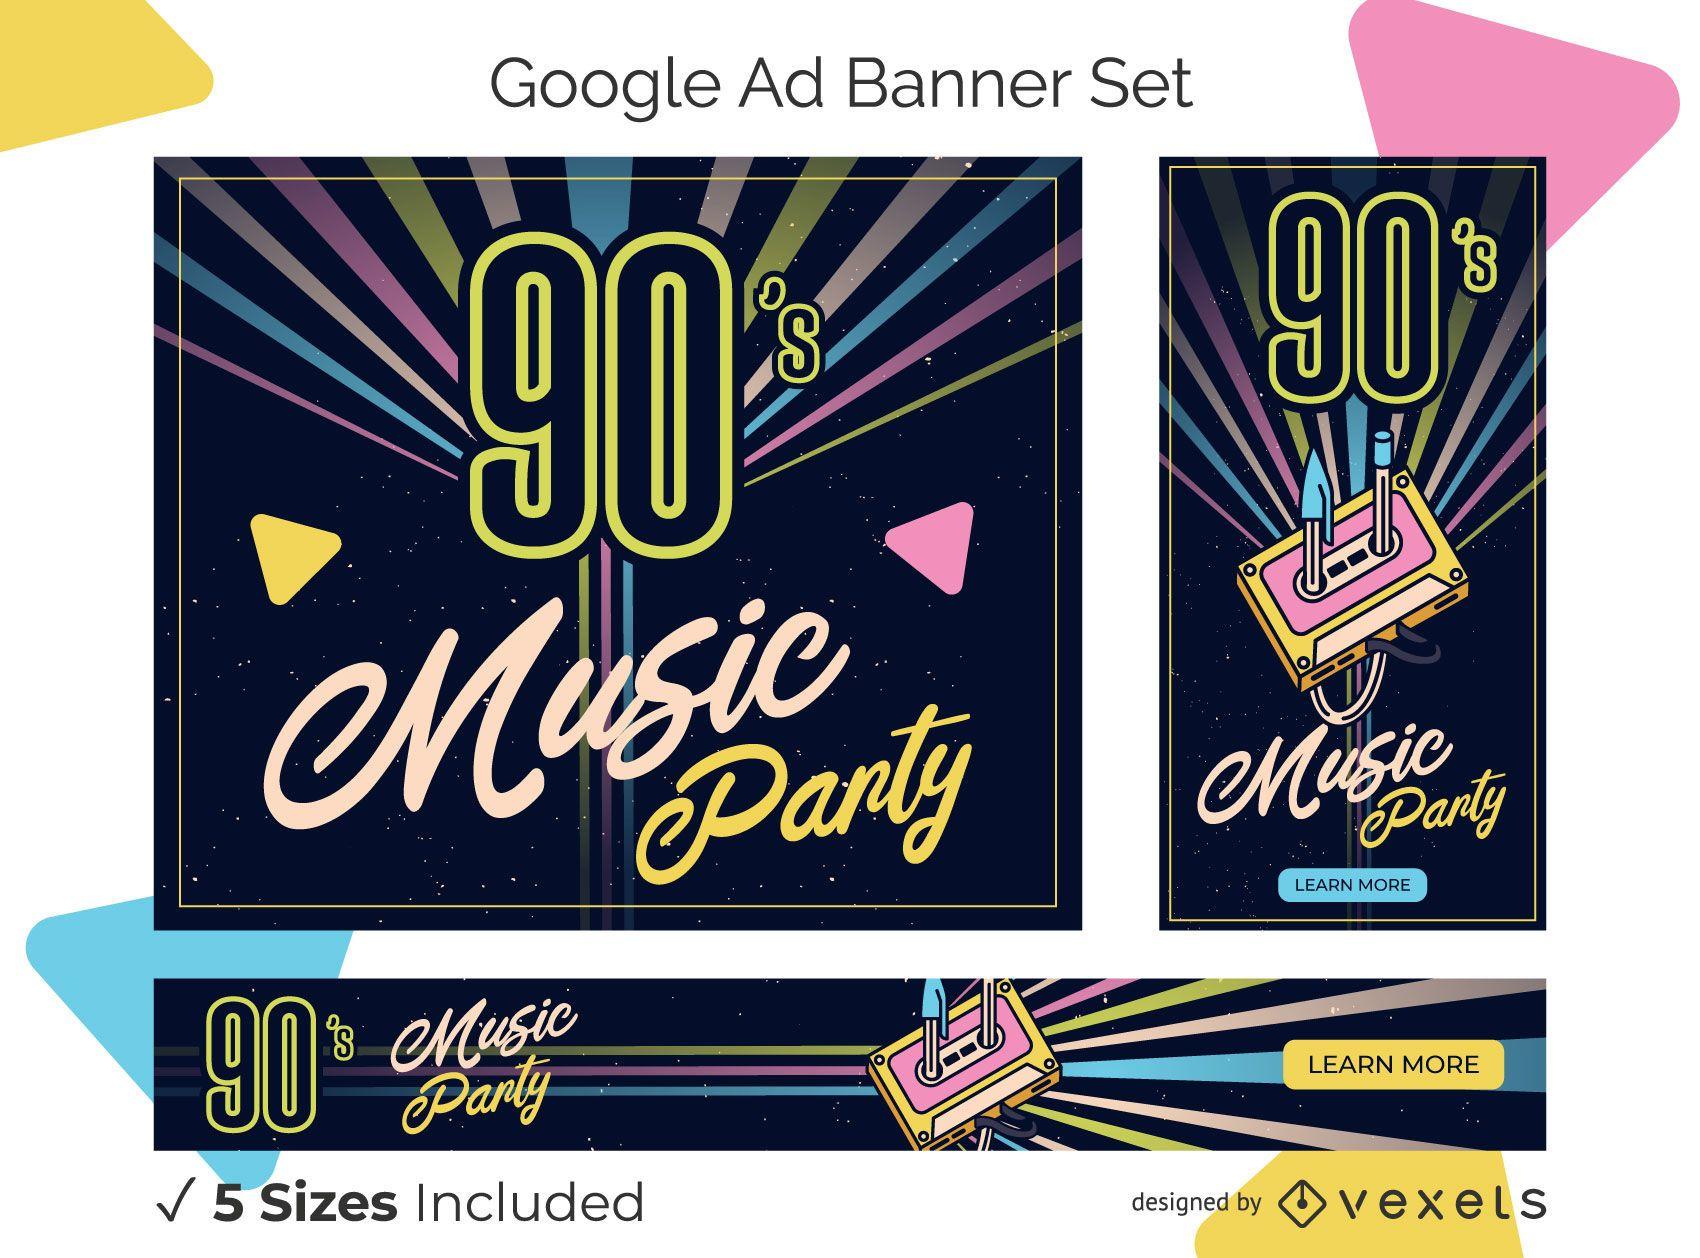 Retro ad banner set